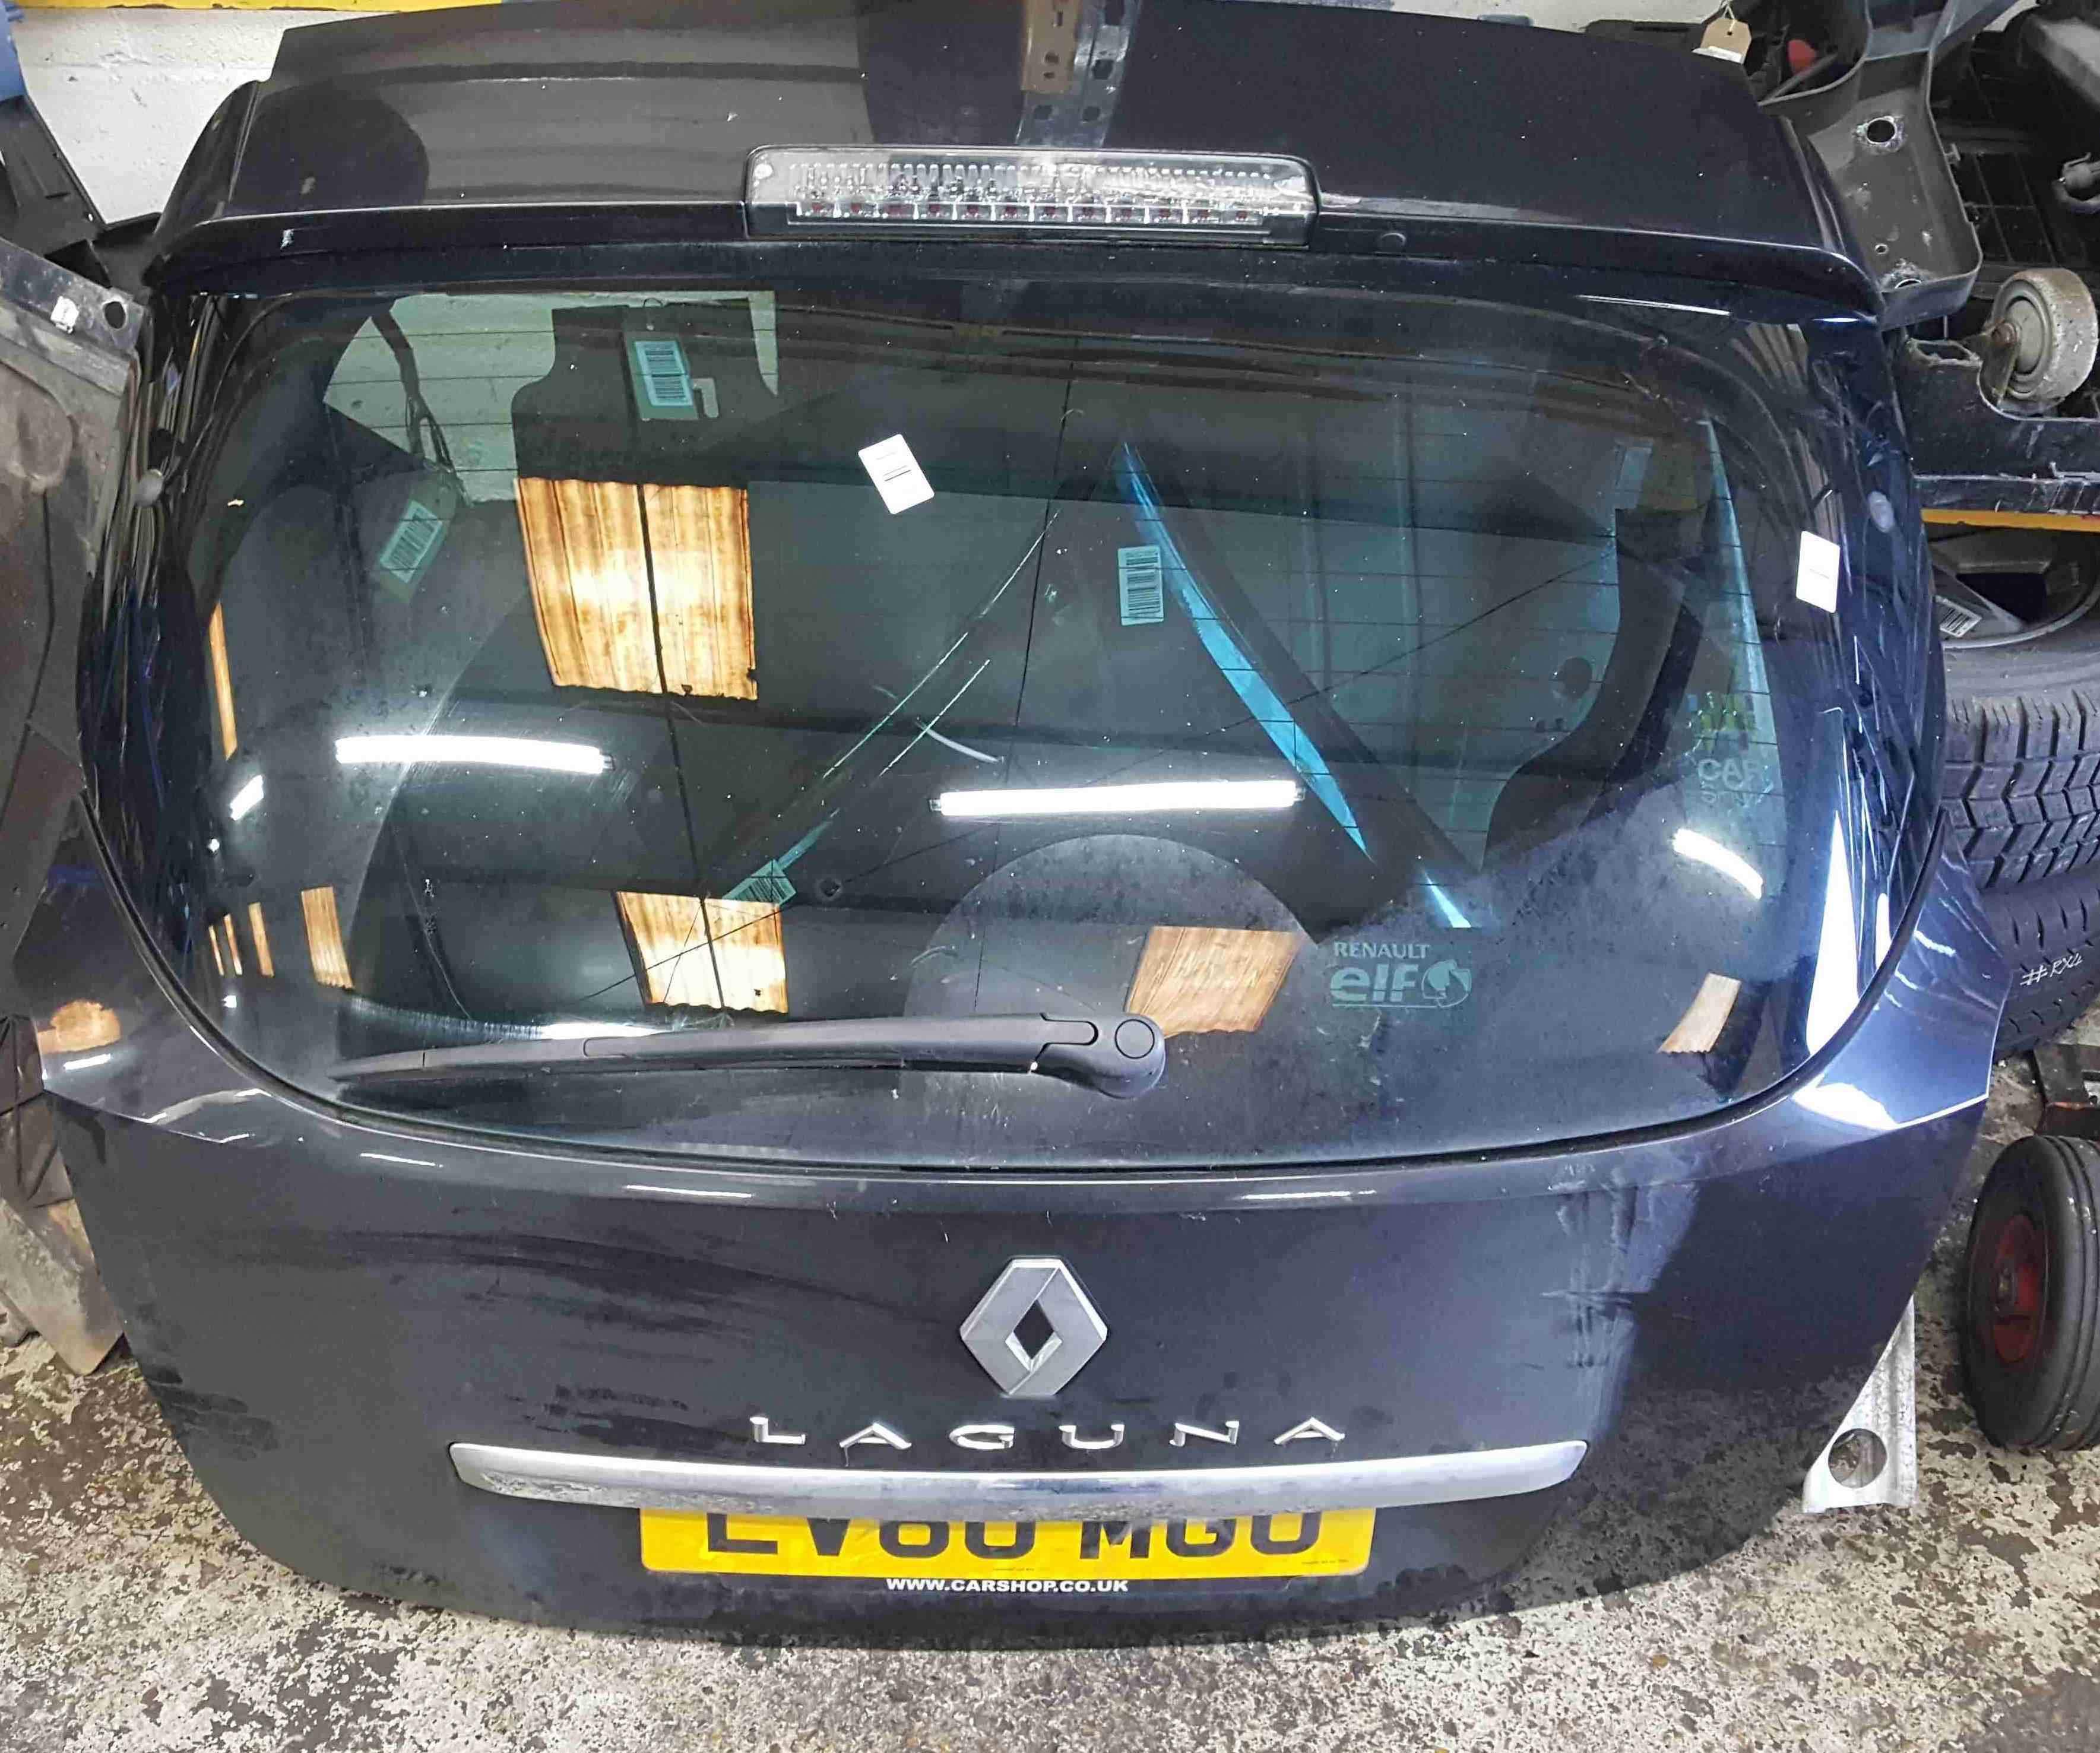 Renault Laguna Estate MK3 2007-2012 Rear Tailgate Boot Black 676